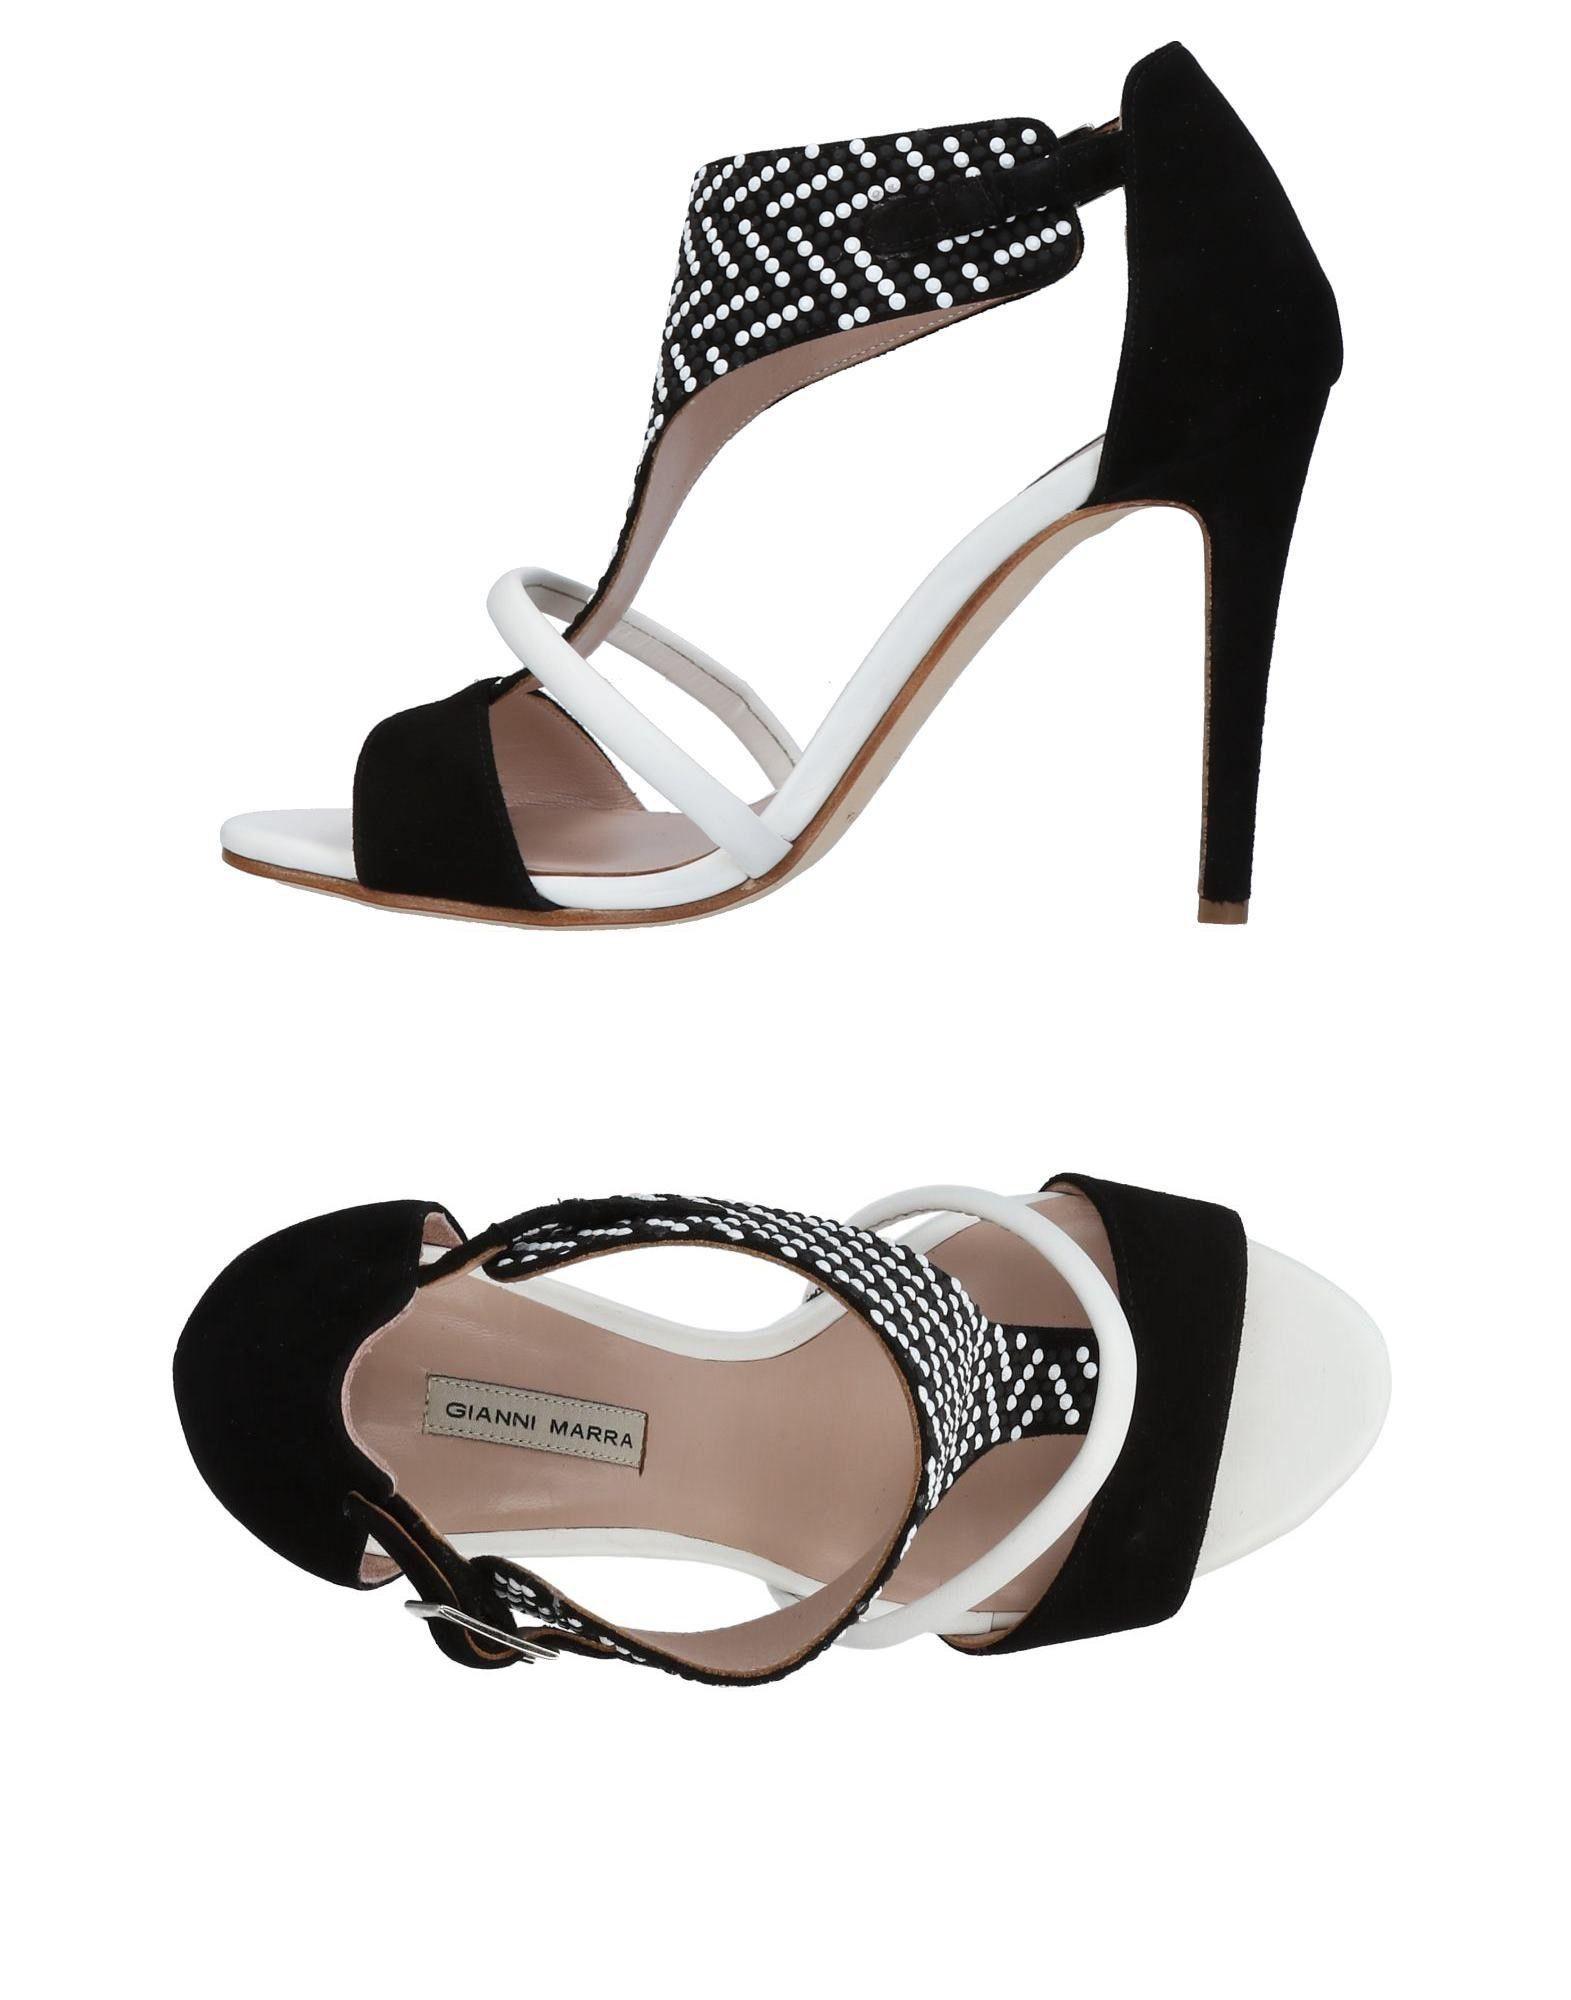 Gianni Marra Sandalen Damen  11430321OW Gute Qualität beliebte Schuhe